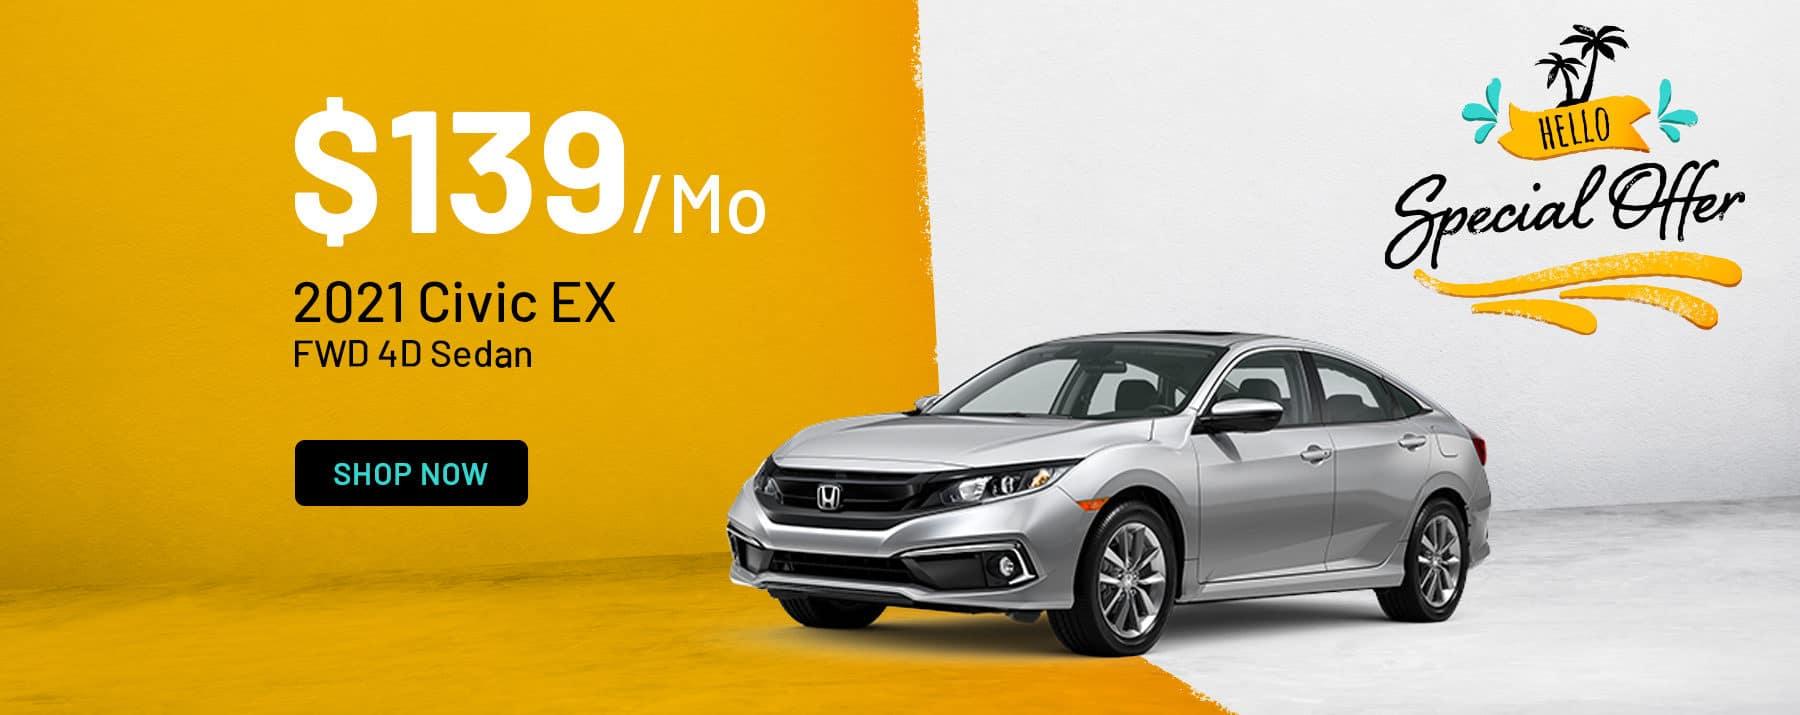 2021 Honda Civic Special Offer